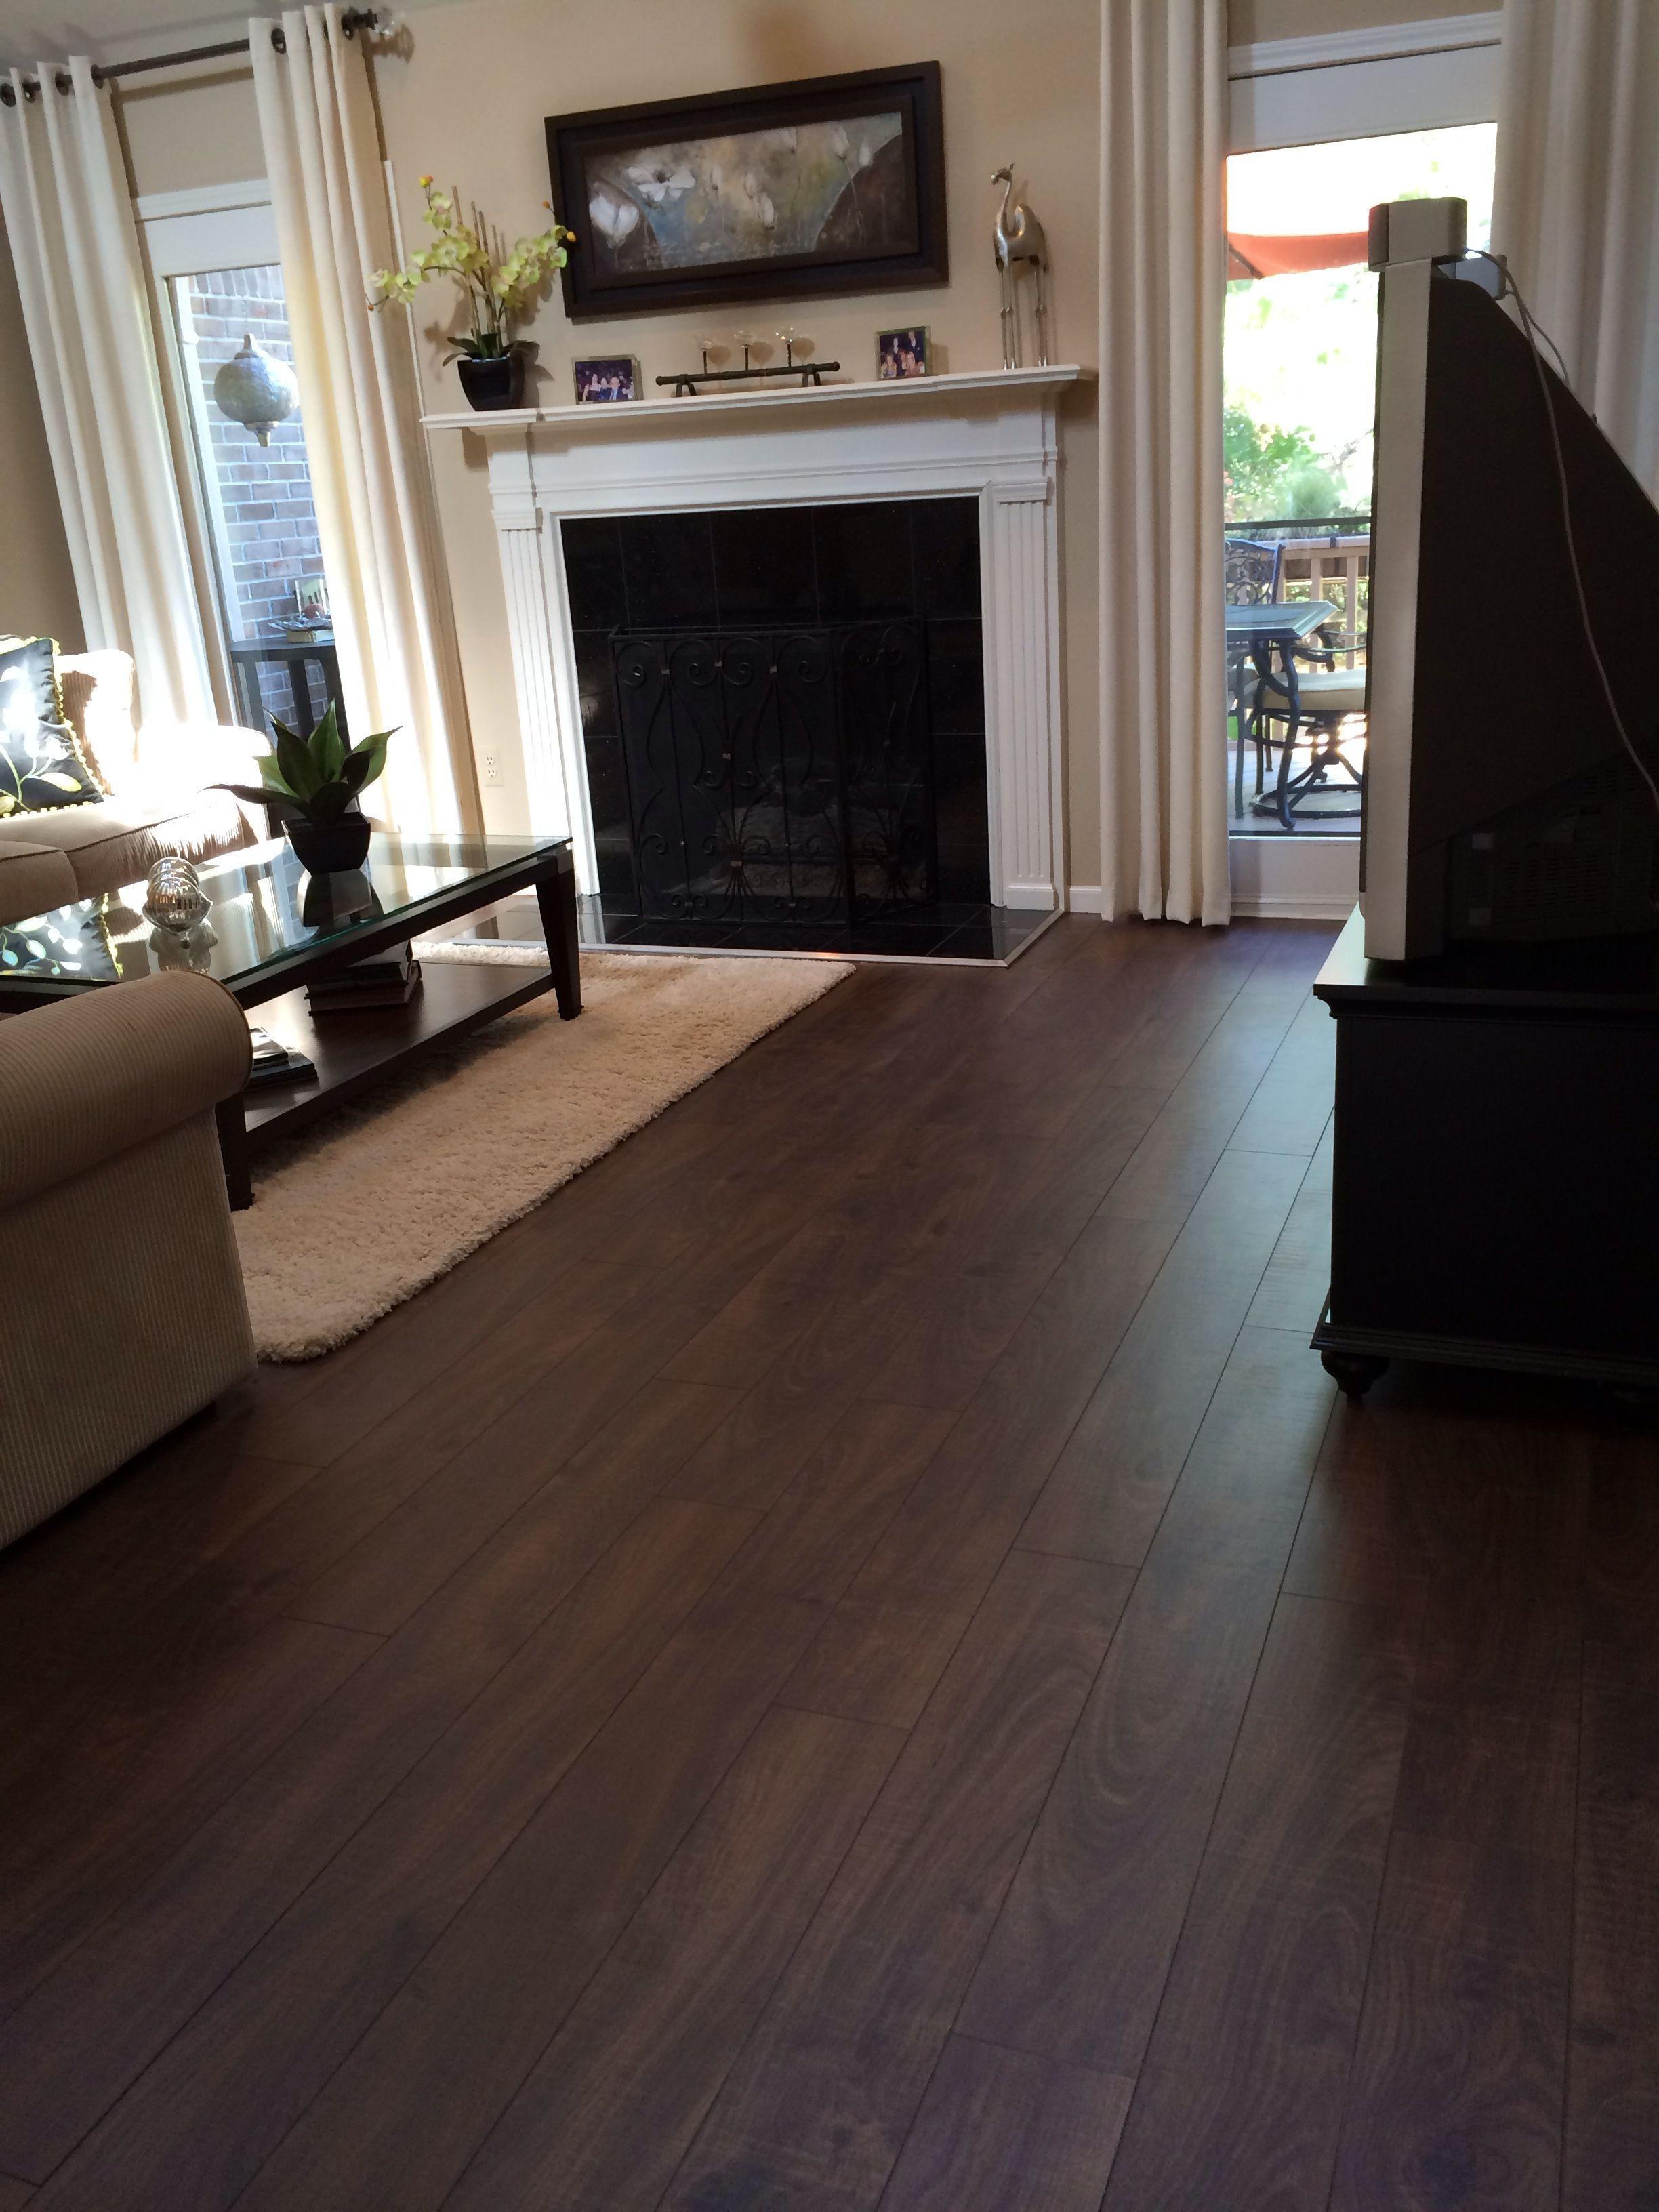 lauzon hardwood flooring prices of quality hardwood floors wood floor pics fresh hardwood flooring inside quality hardwood floors wood floor pics fresh hardwood flooring fresh laminate floors